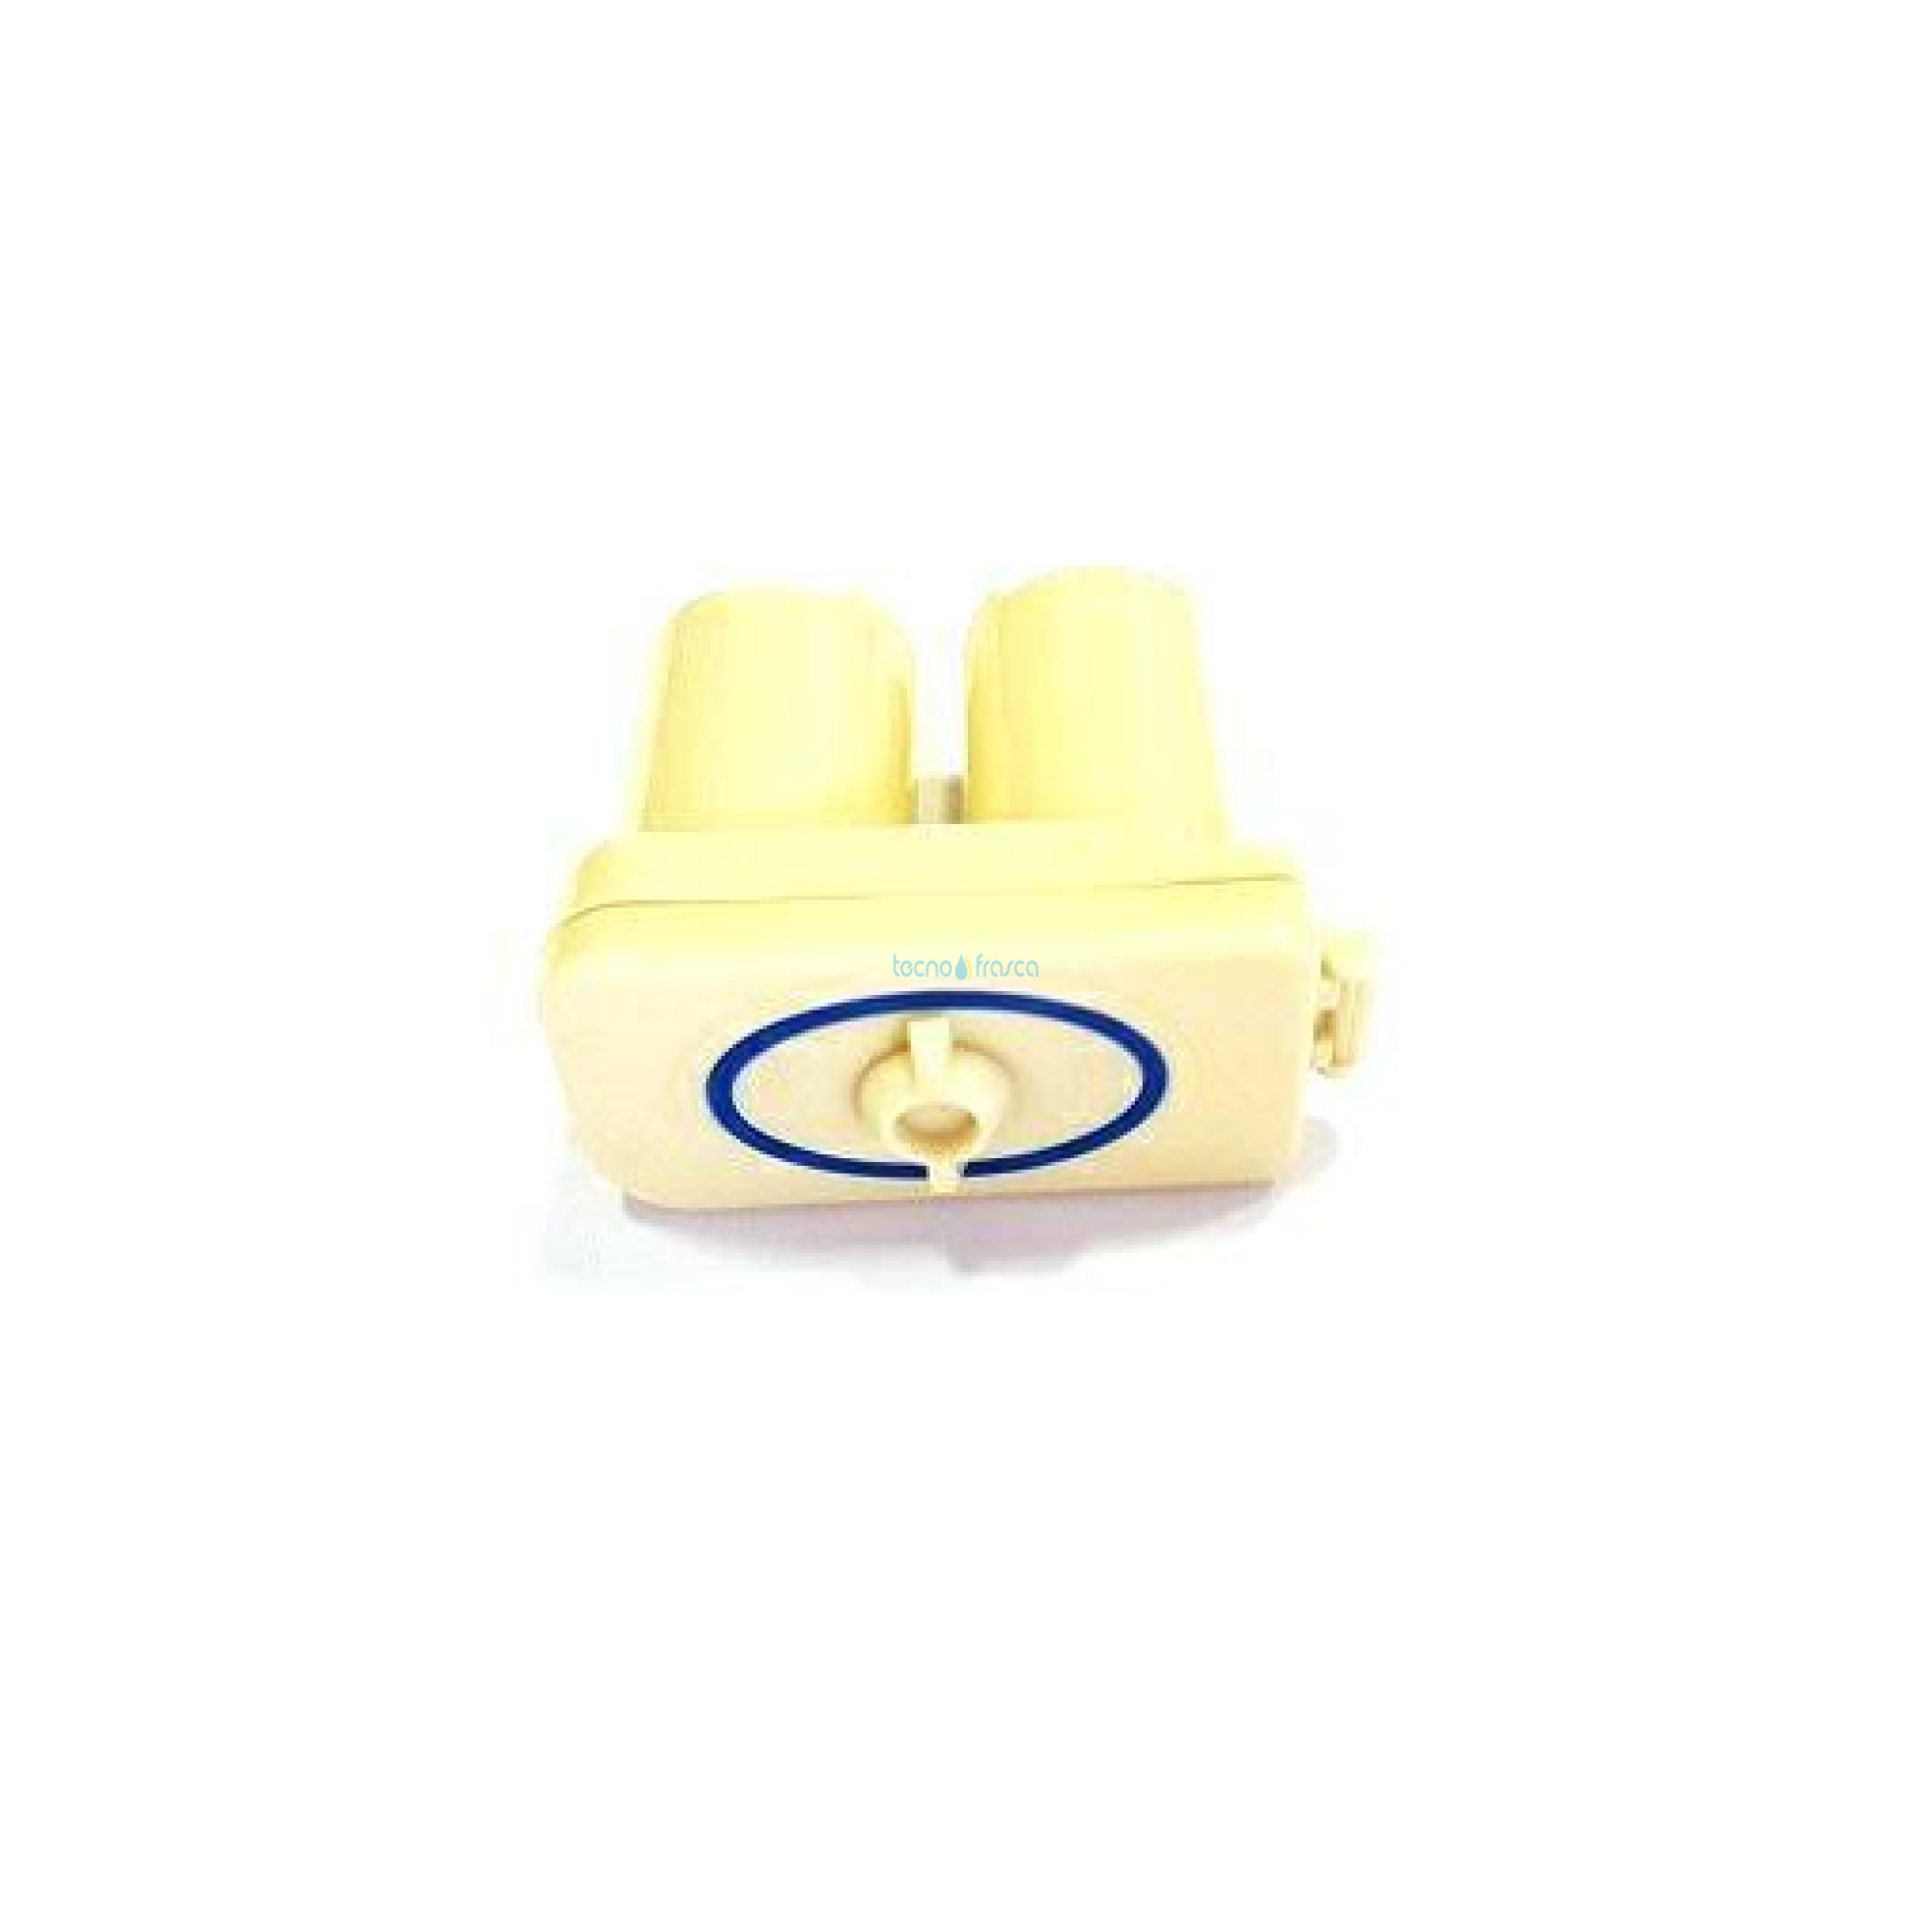 Ariston porta batterie 65153110